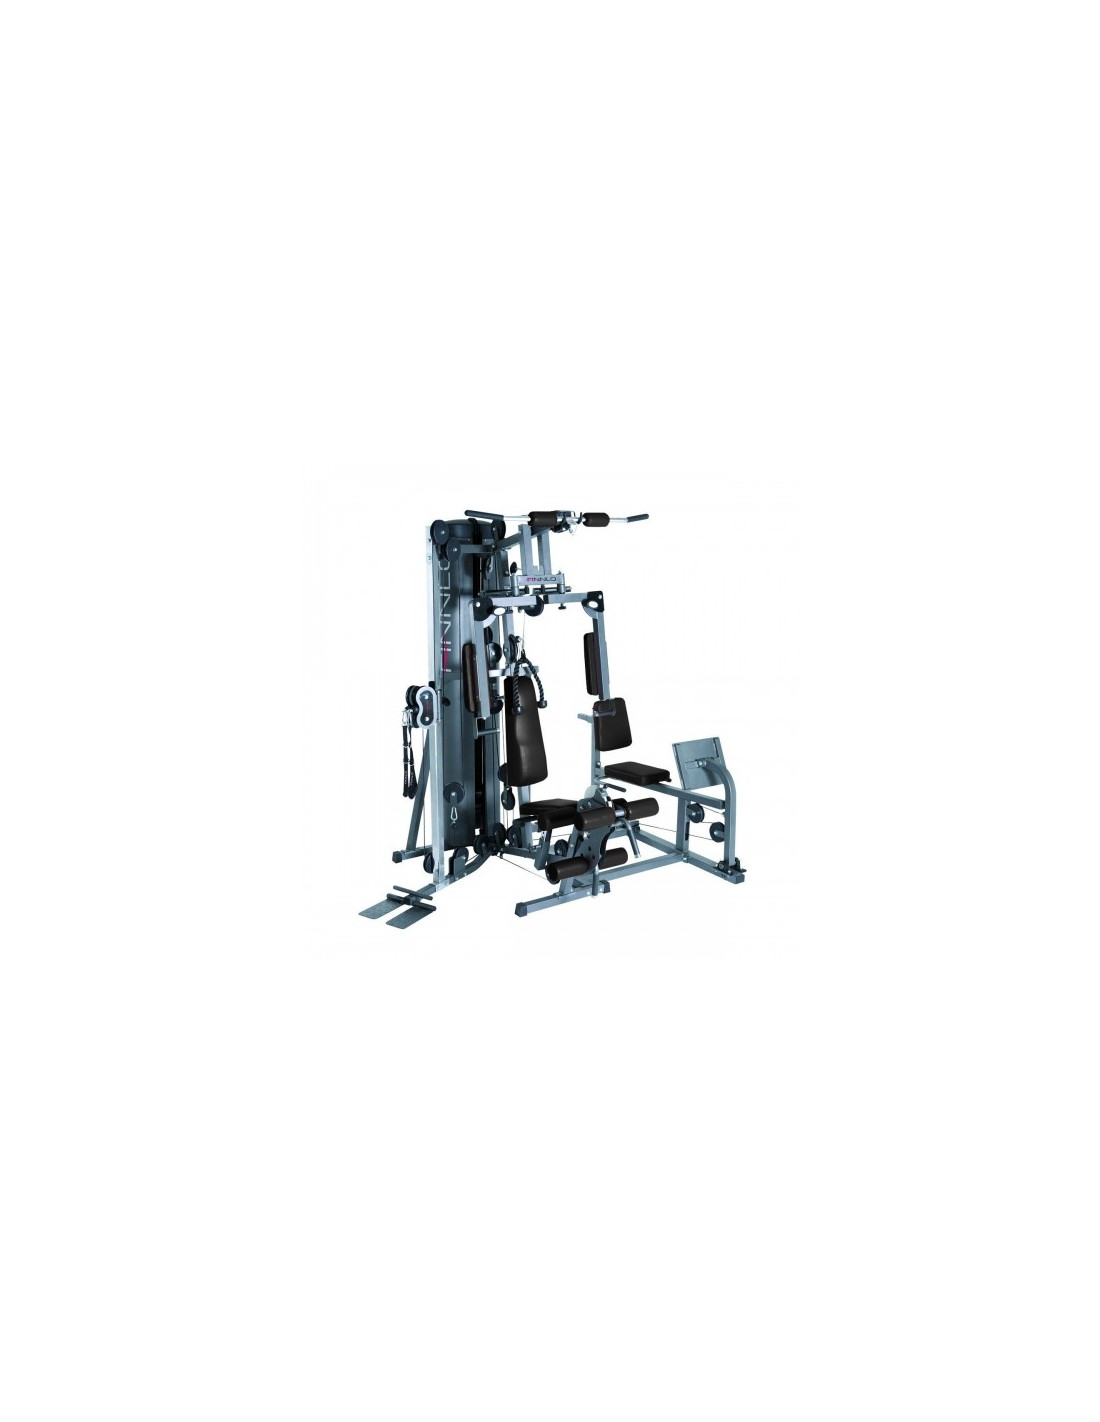 finnlo kraftstation autark 2500 black edition zum. Black Bedroom Furniture Sets. Home Design Ideas